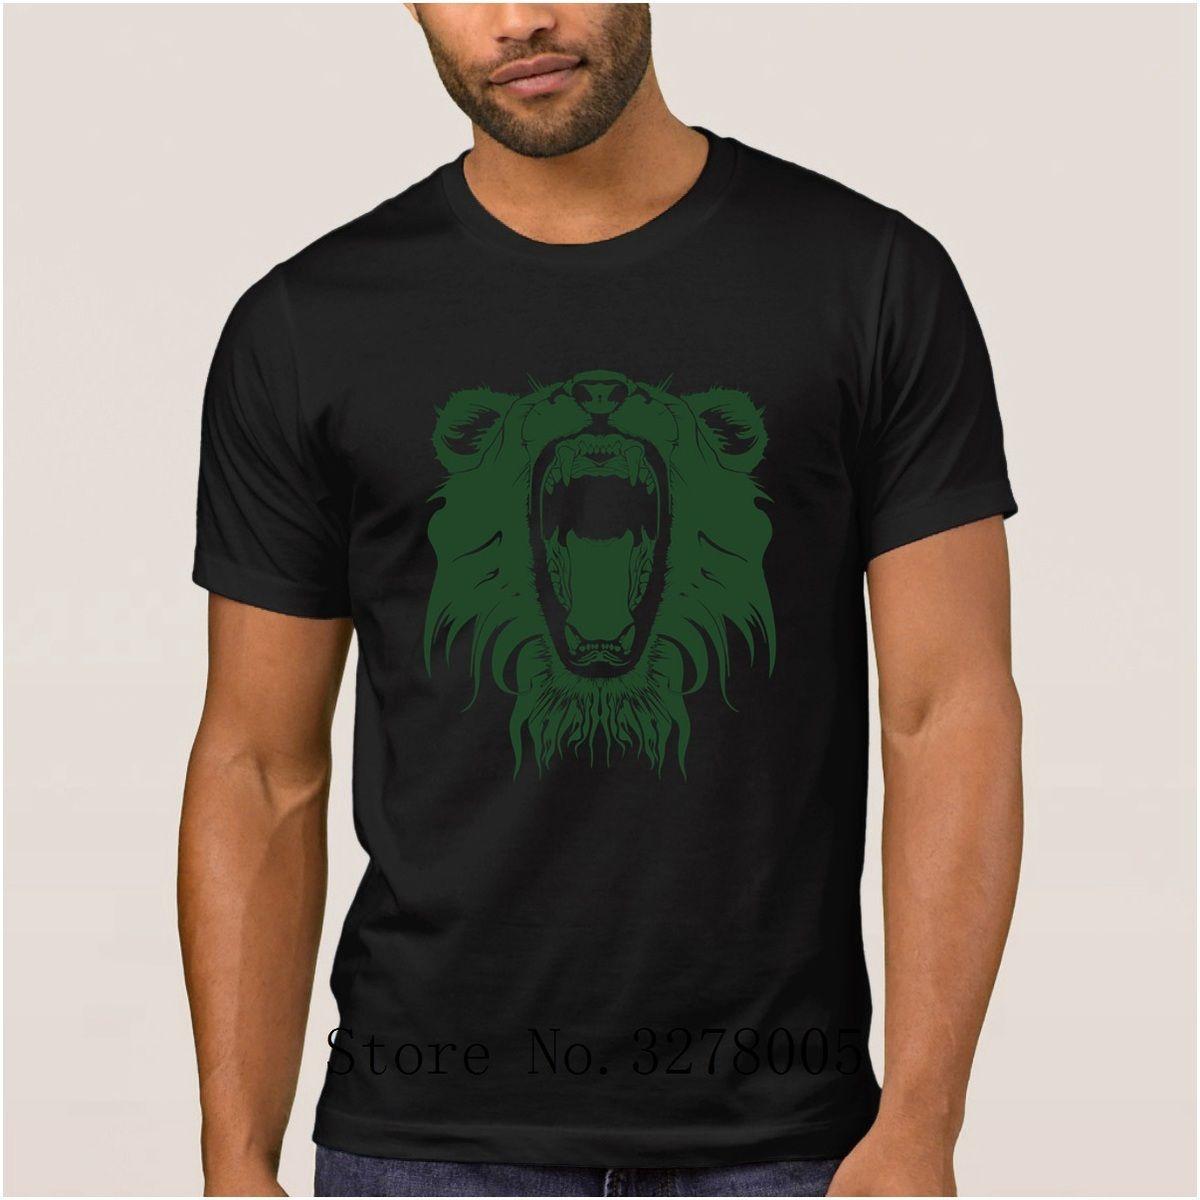 c059b8137 Brand La Maxpa Design Famous Lion Roar T Shirt For Men Funky Pattern  Regular T Shirt 2018 O Neck Unisex Tshirt For Men Tee Tops Tee T Shirts  Tees T Shirt ...